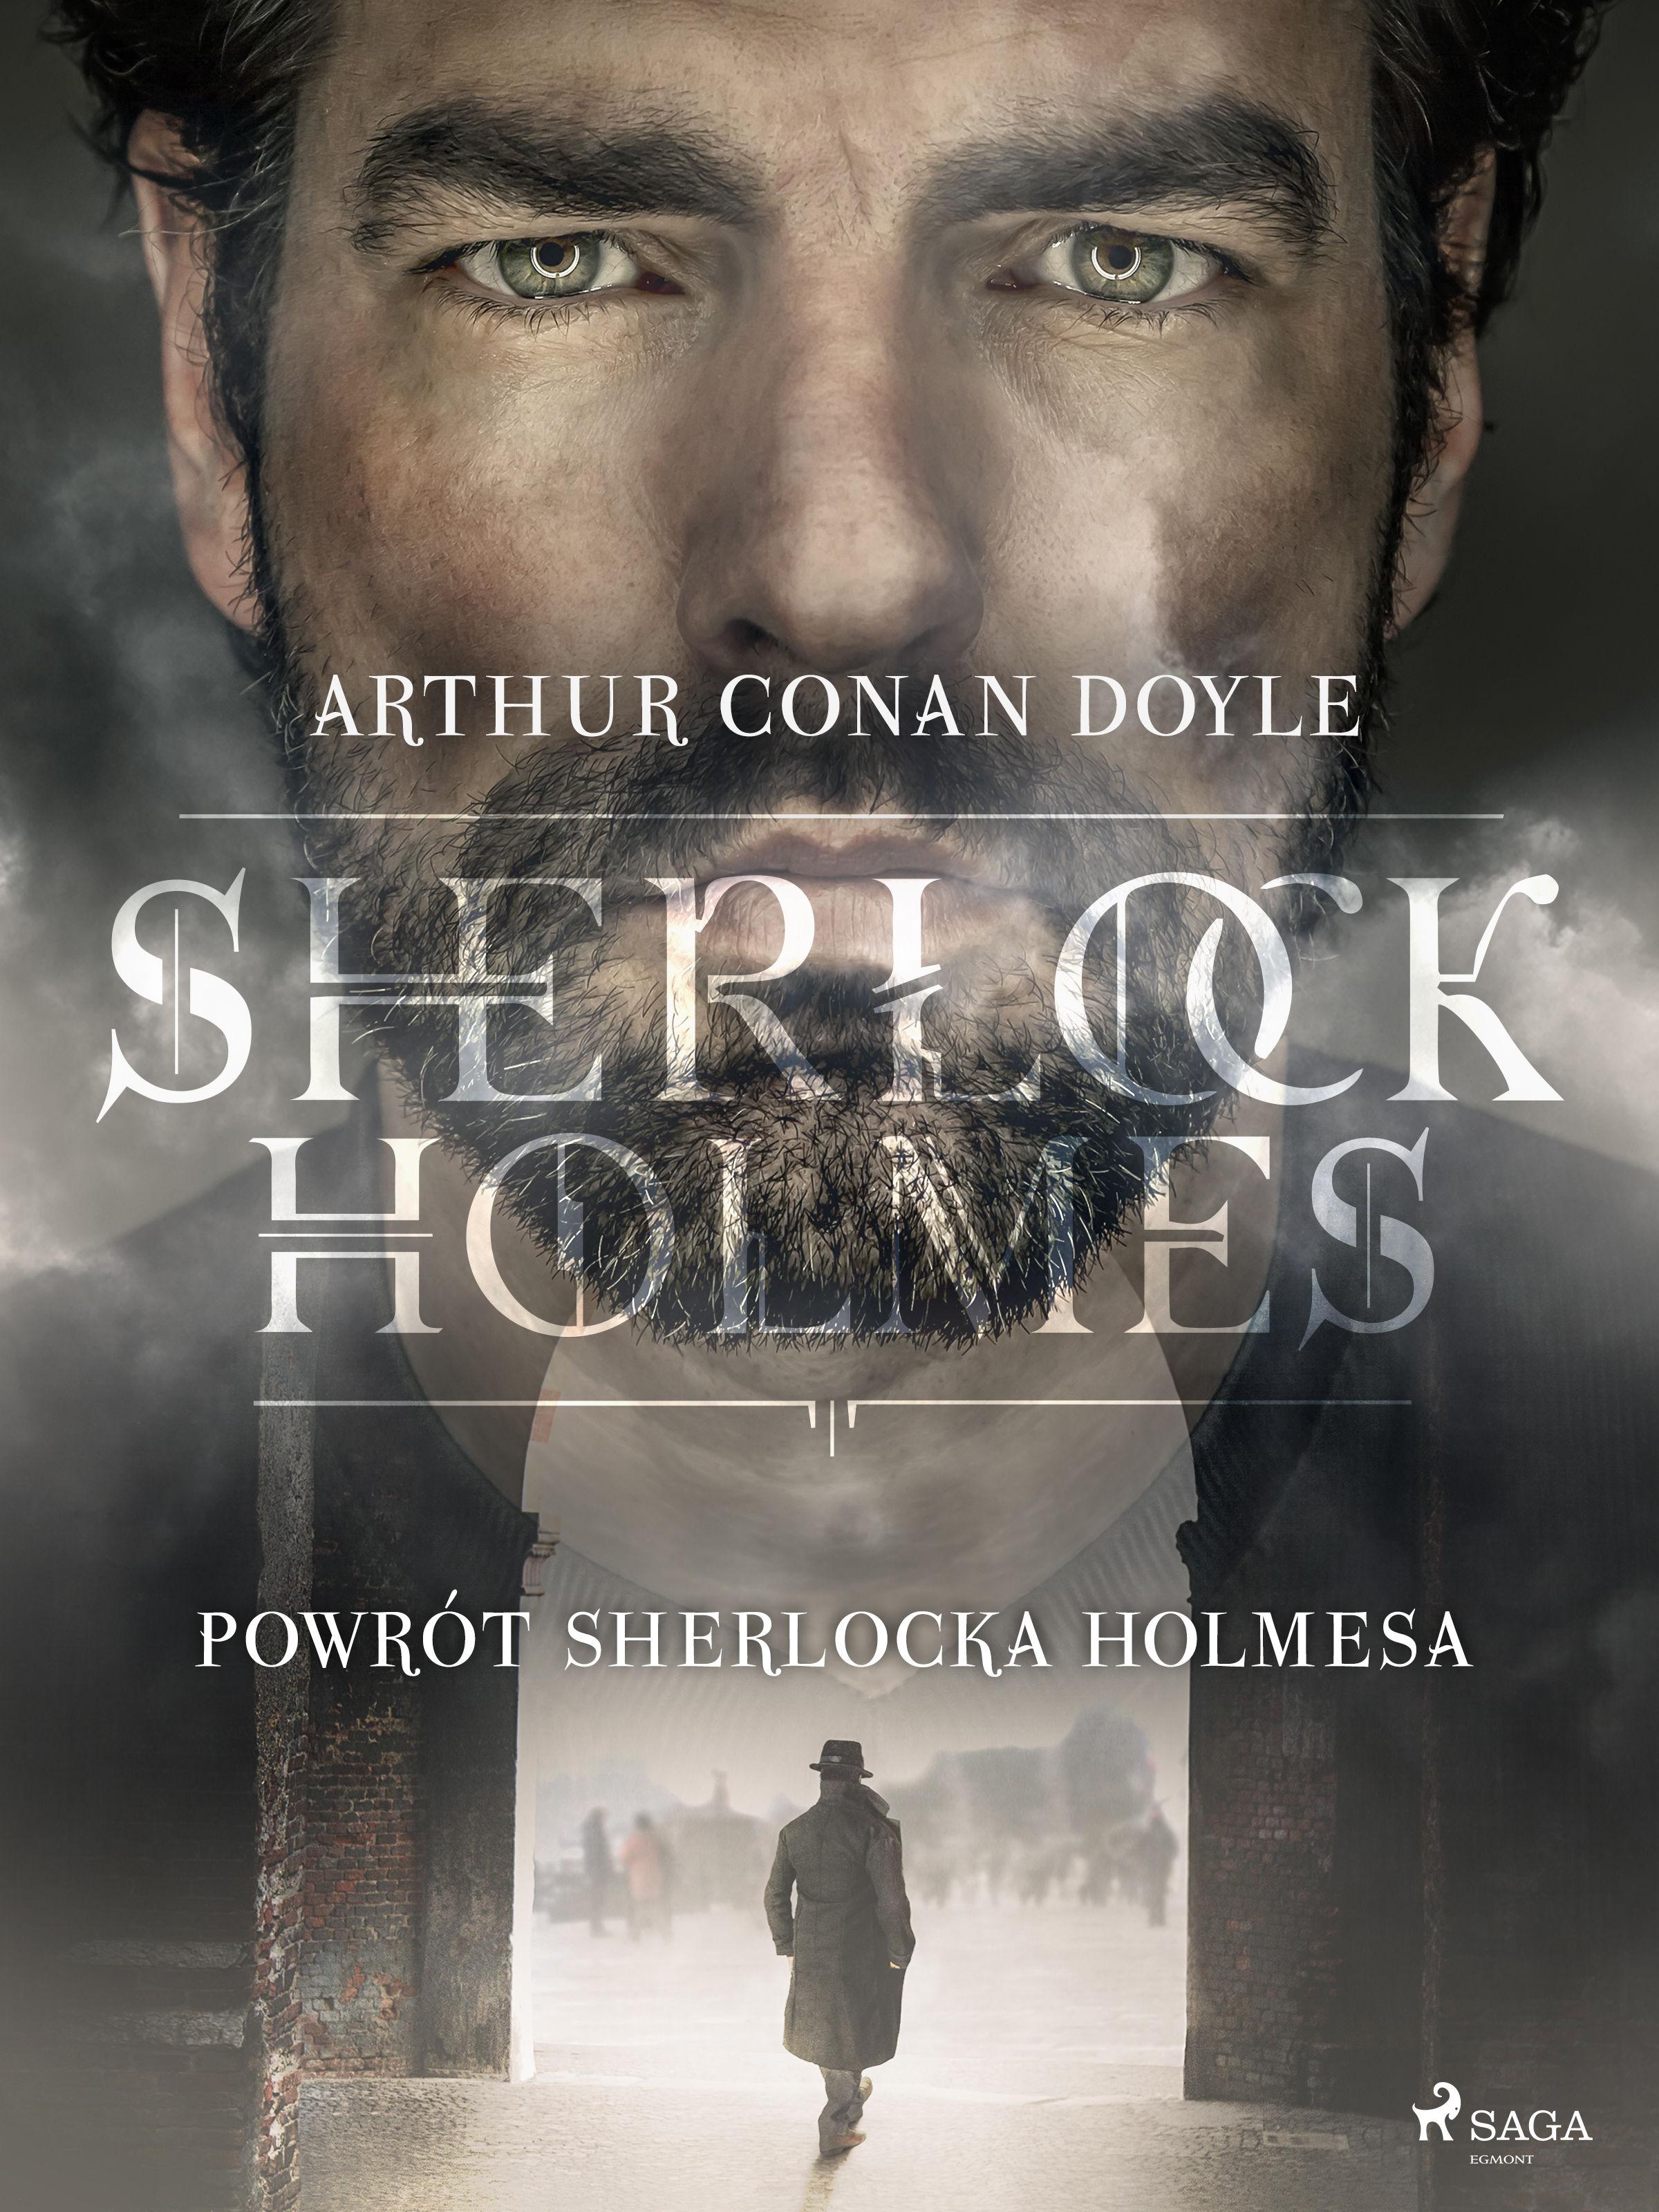 Powrót Sherlocka Holmesa - Arthur Conan Doyle - ebook